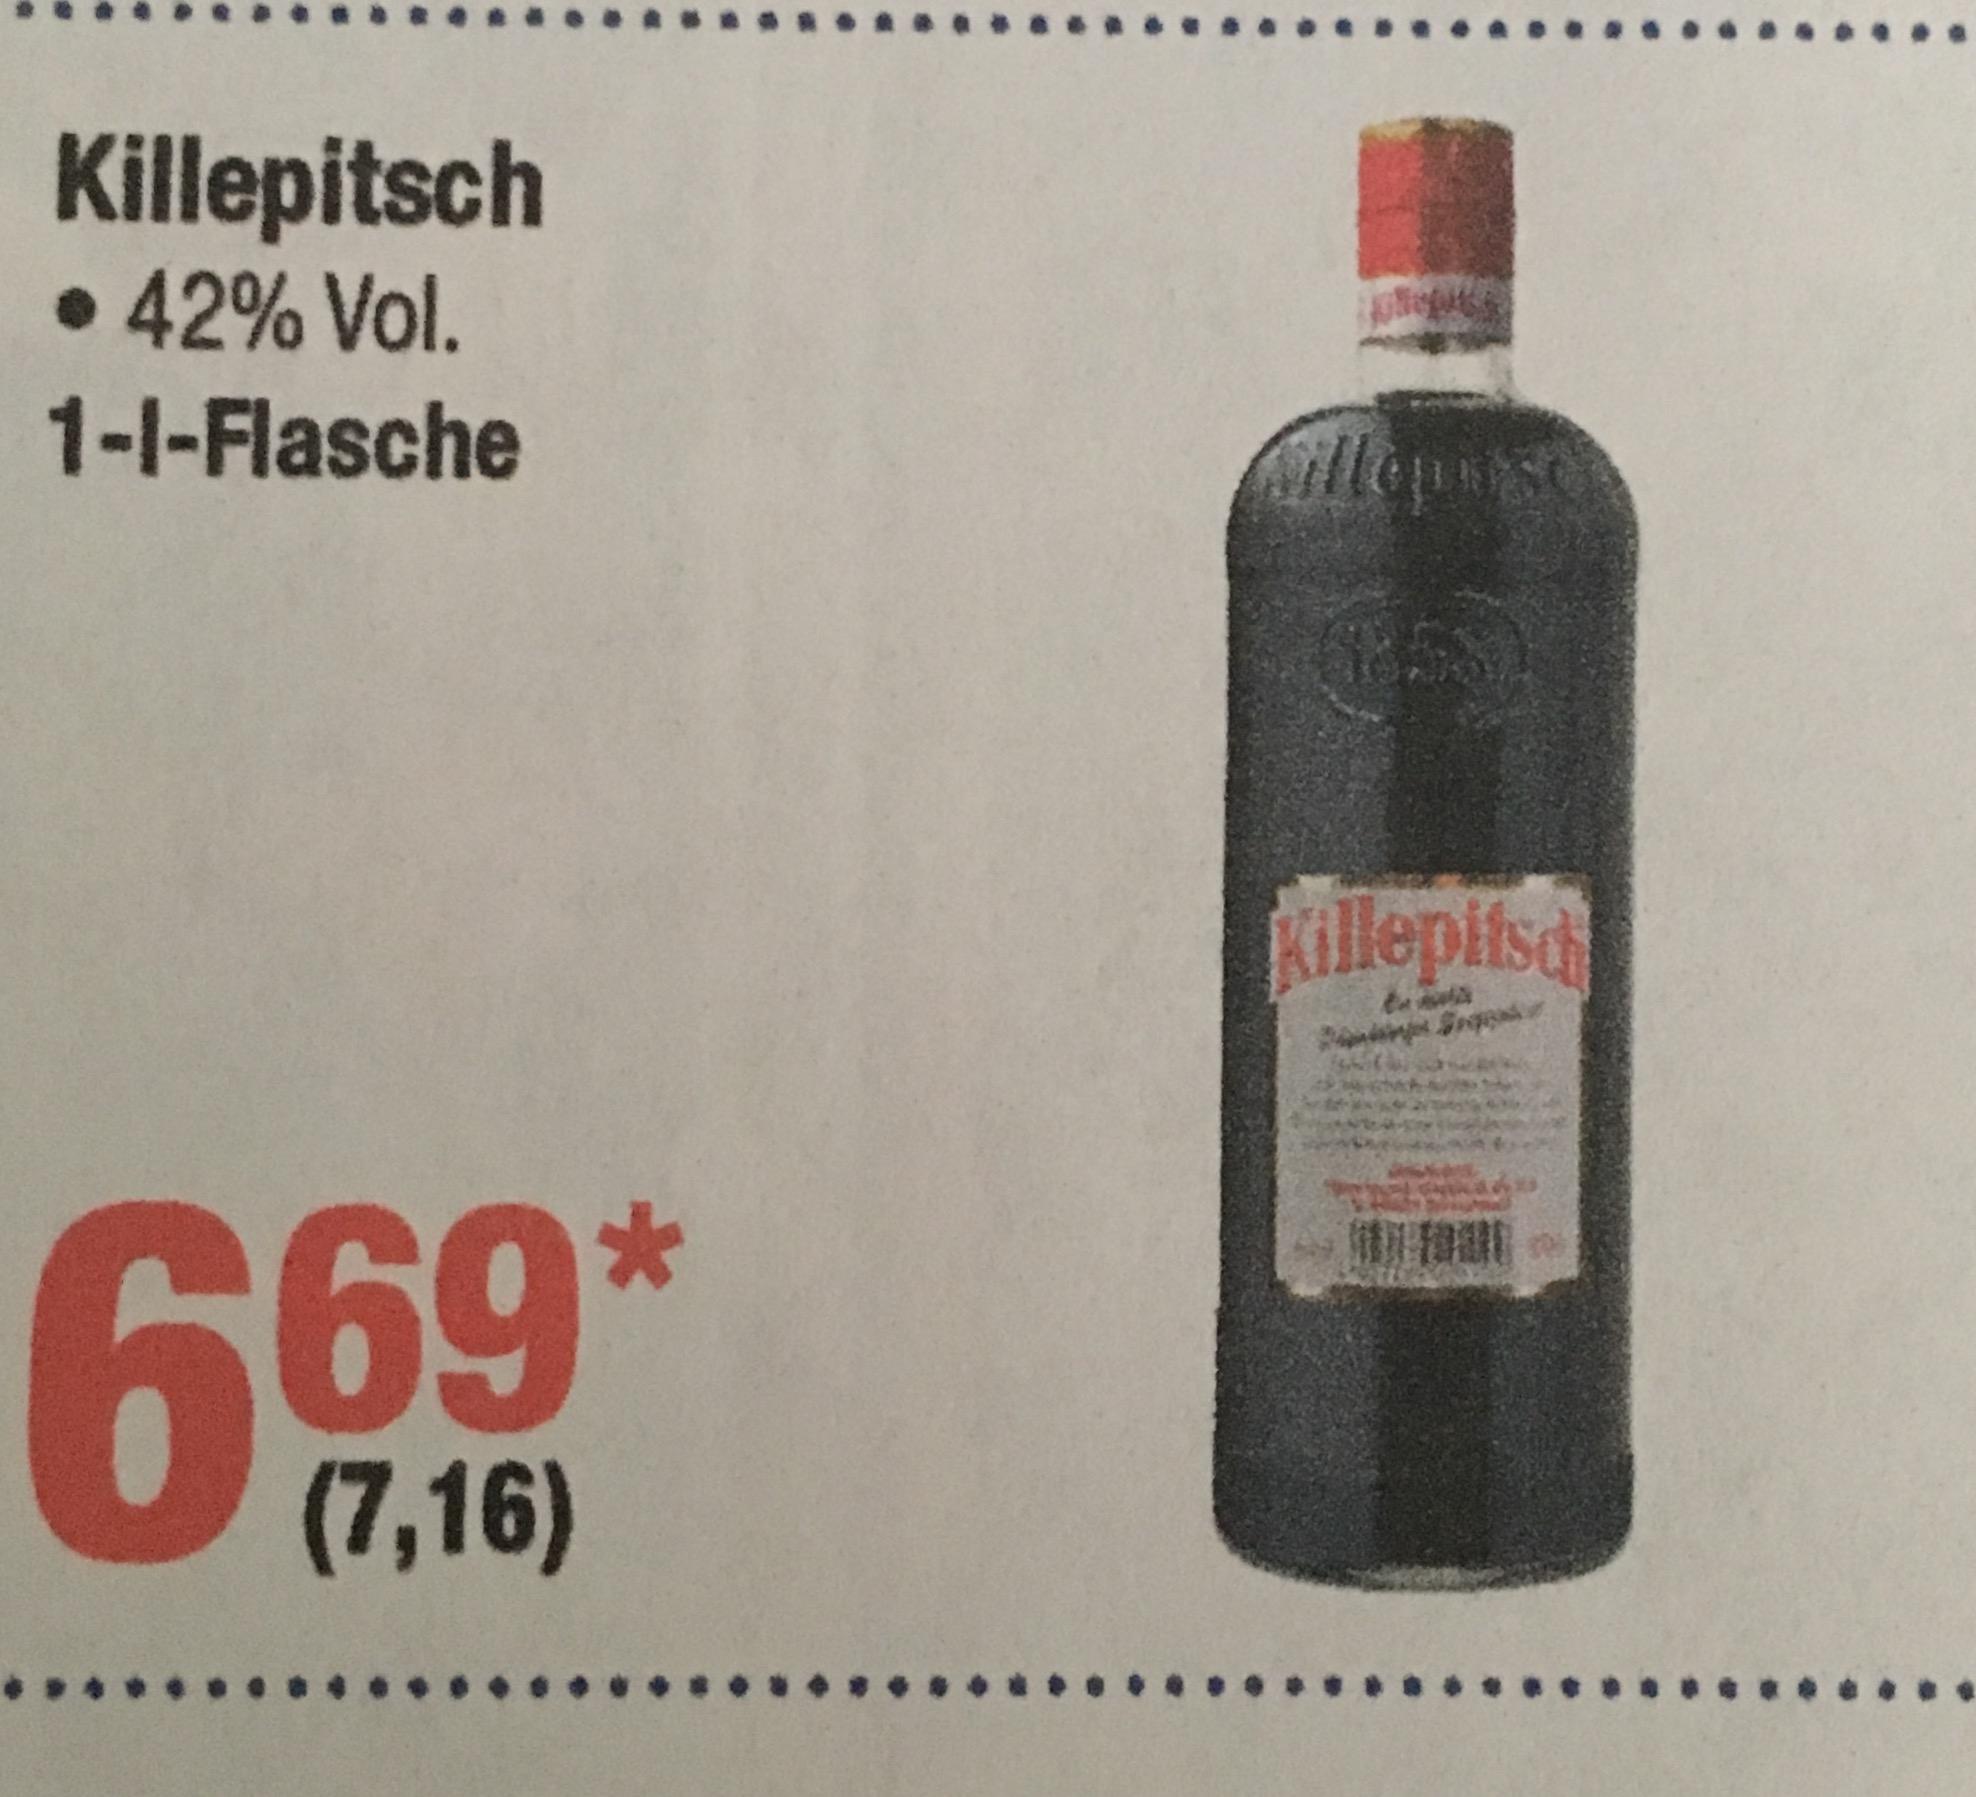 [lokal?] [Metro Koblenz] Killepitsch 1l nur 7,16€!